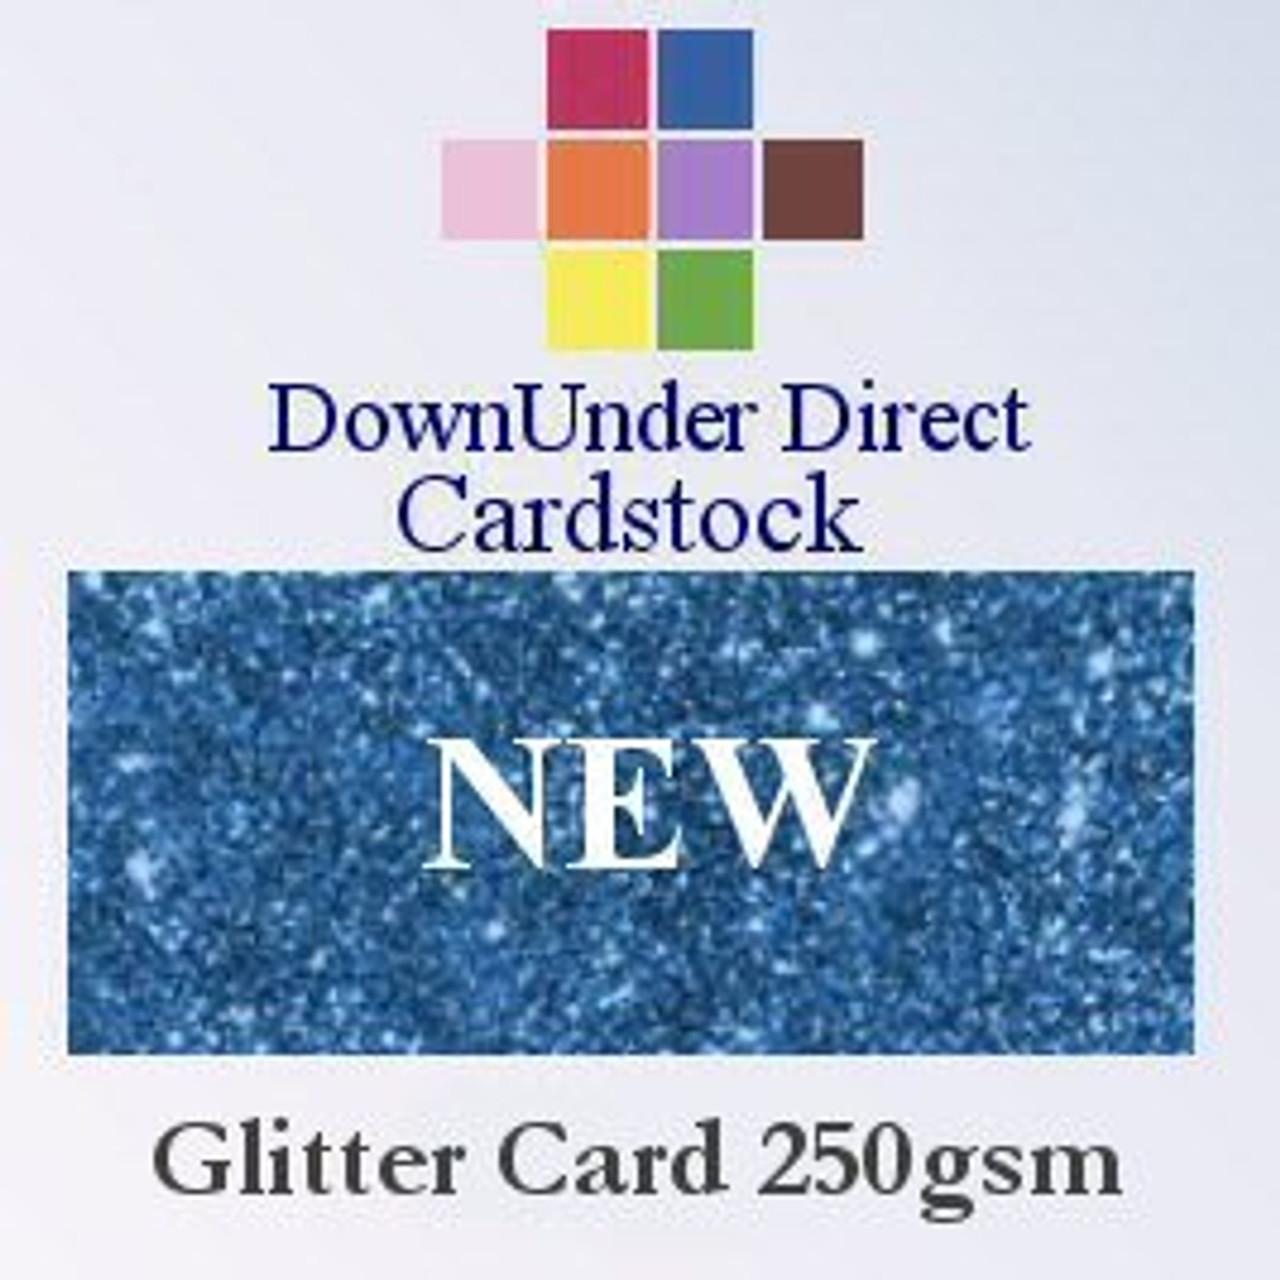 NEW 2020 Glitter Card 250gsm